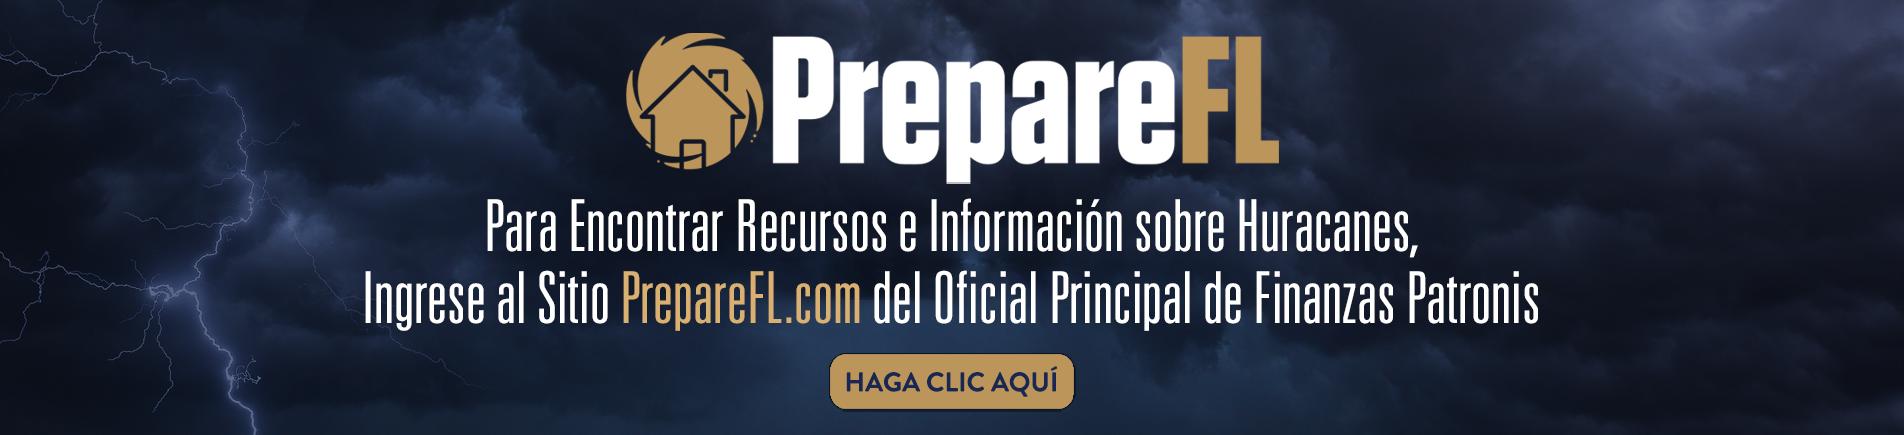 Información sobre PrepareFL